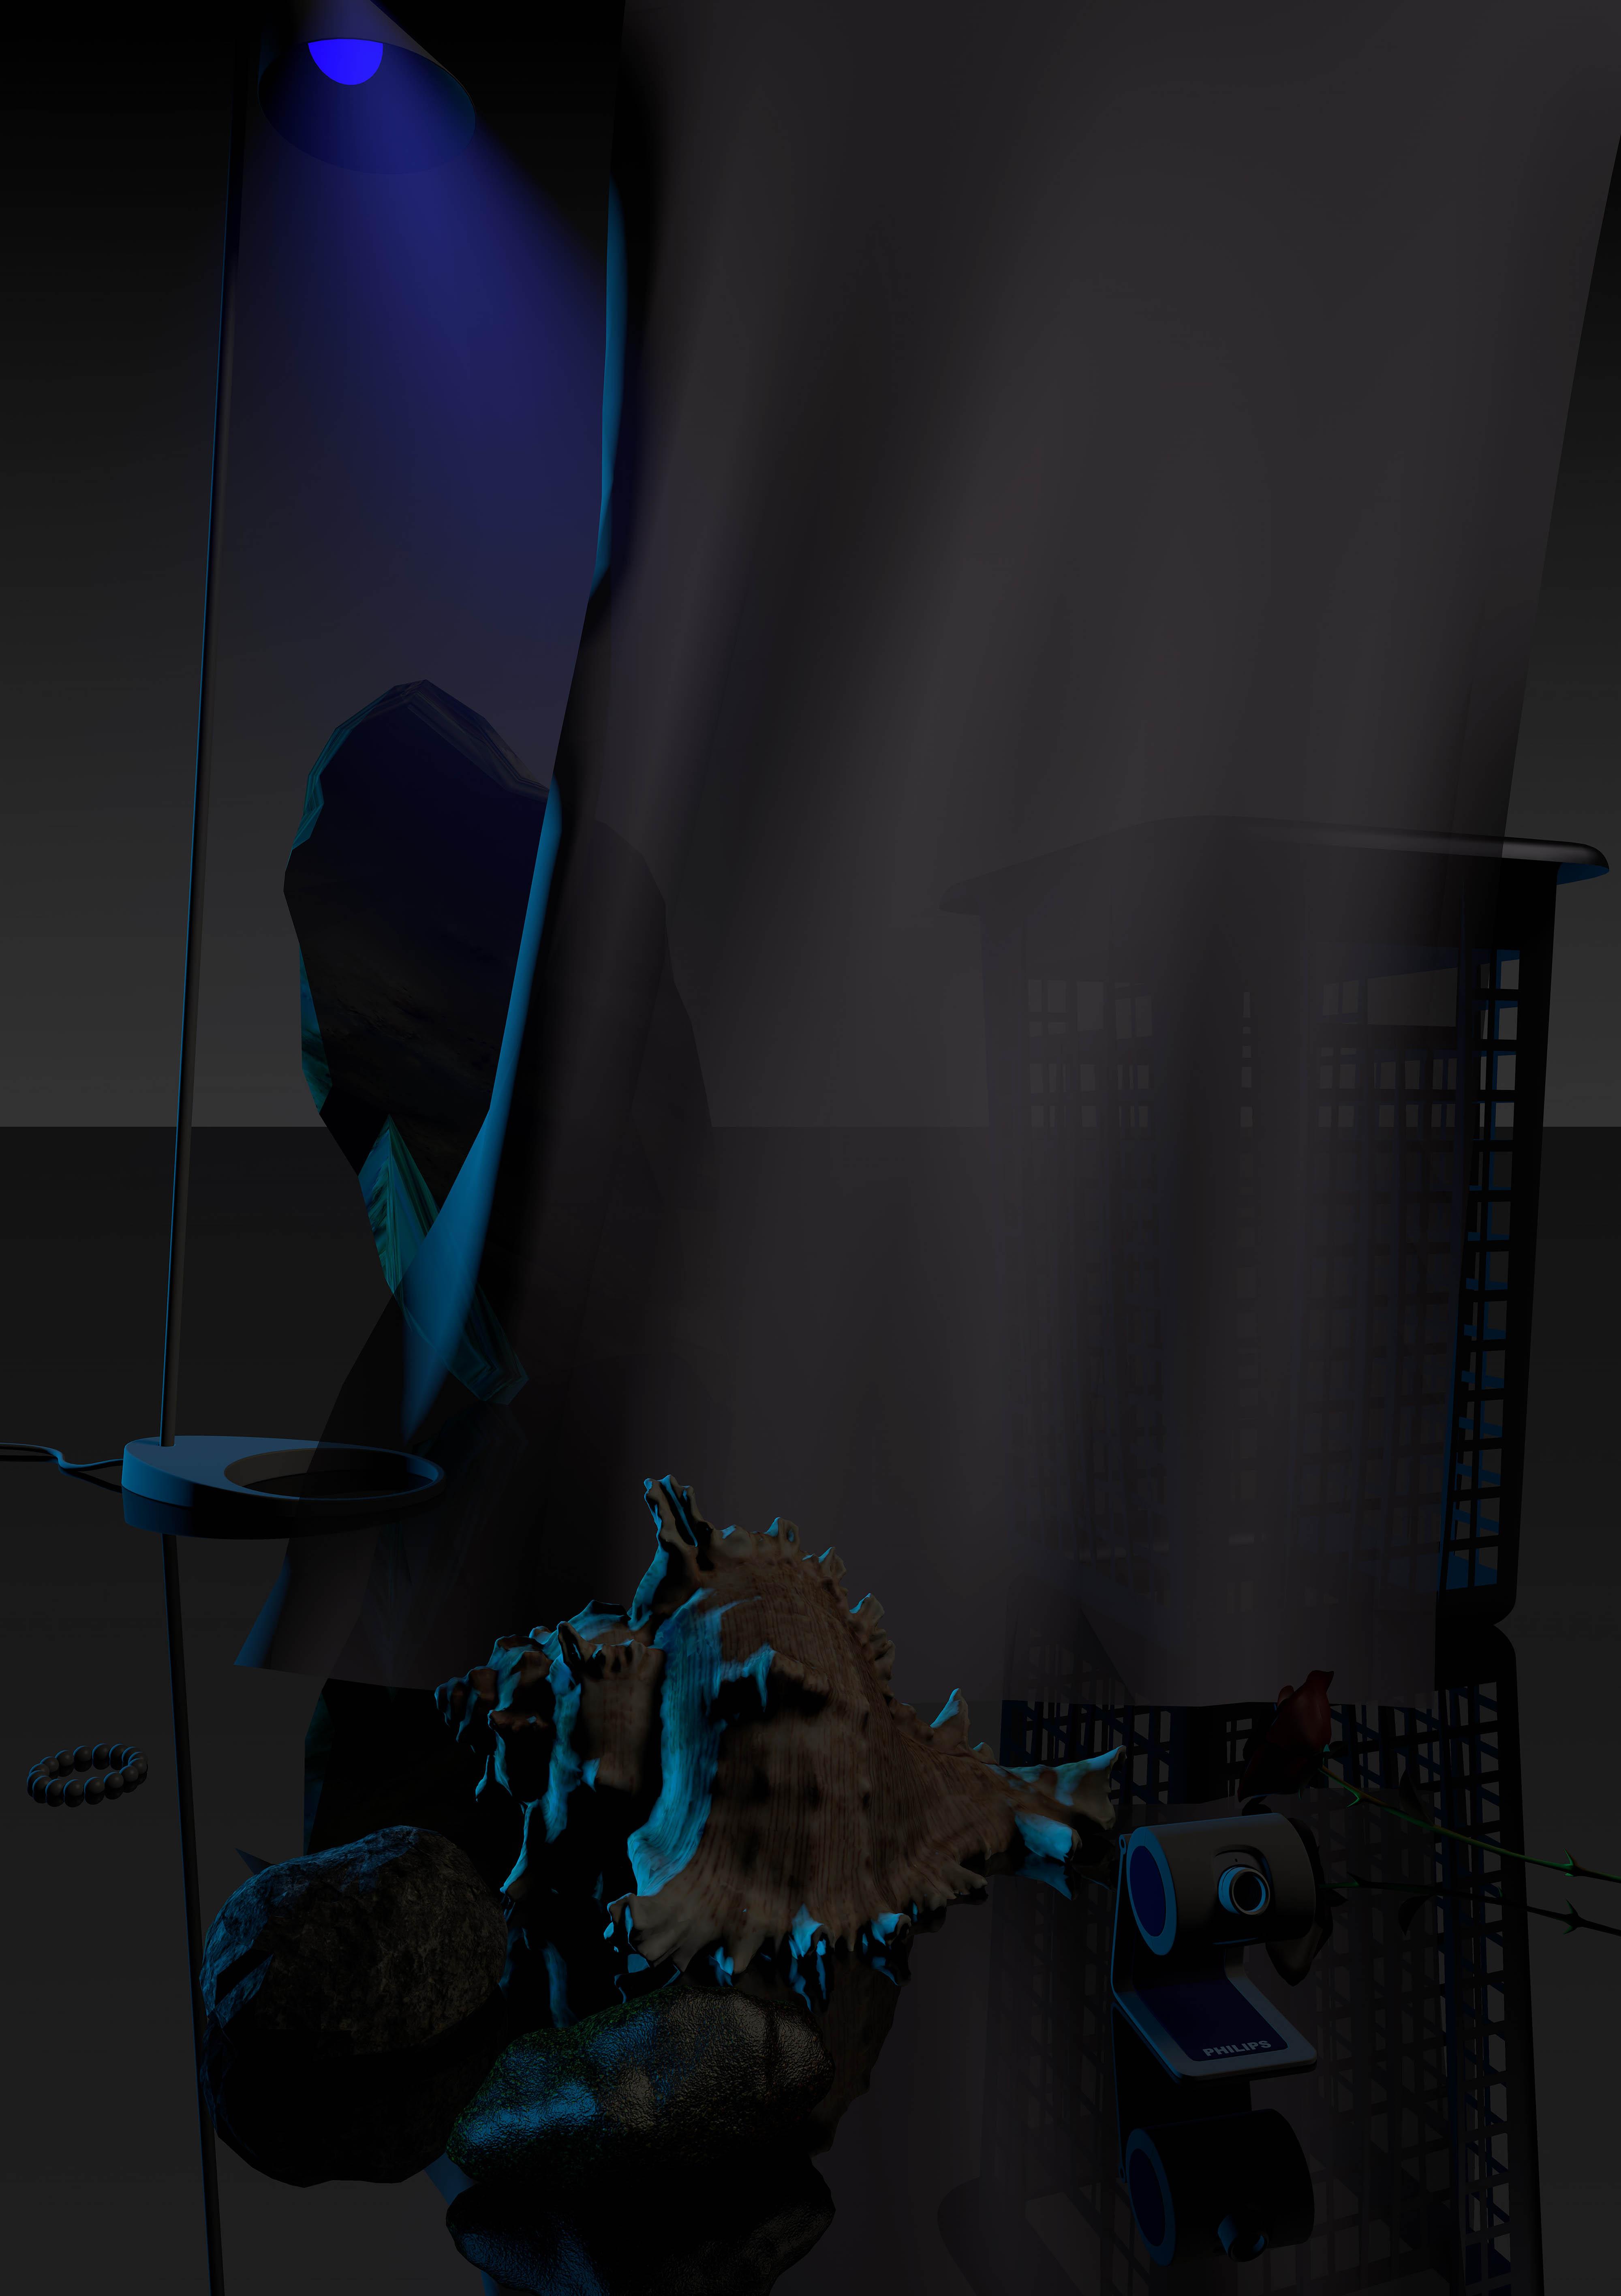 16 - Lindsay Lawson Eminent Still Life 2016 Inkjet print on aluminum dibond 841x1189 cm - Courtesy Studiolo Milan